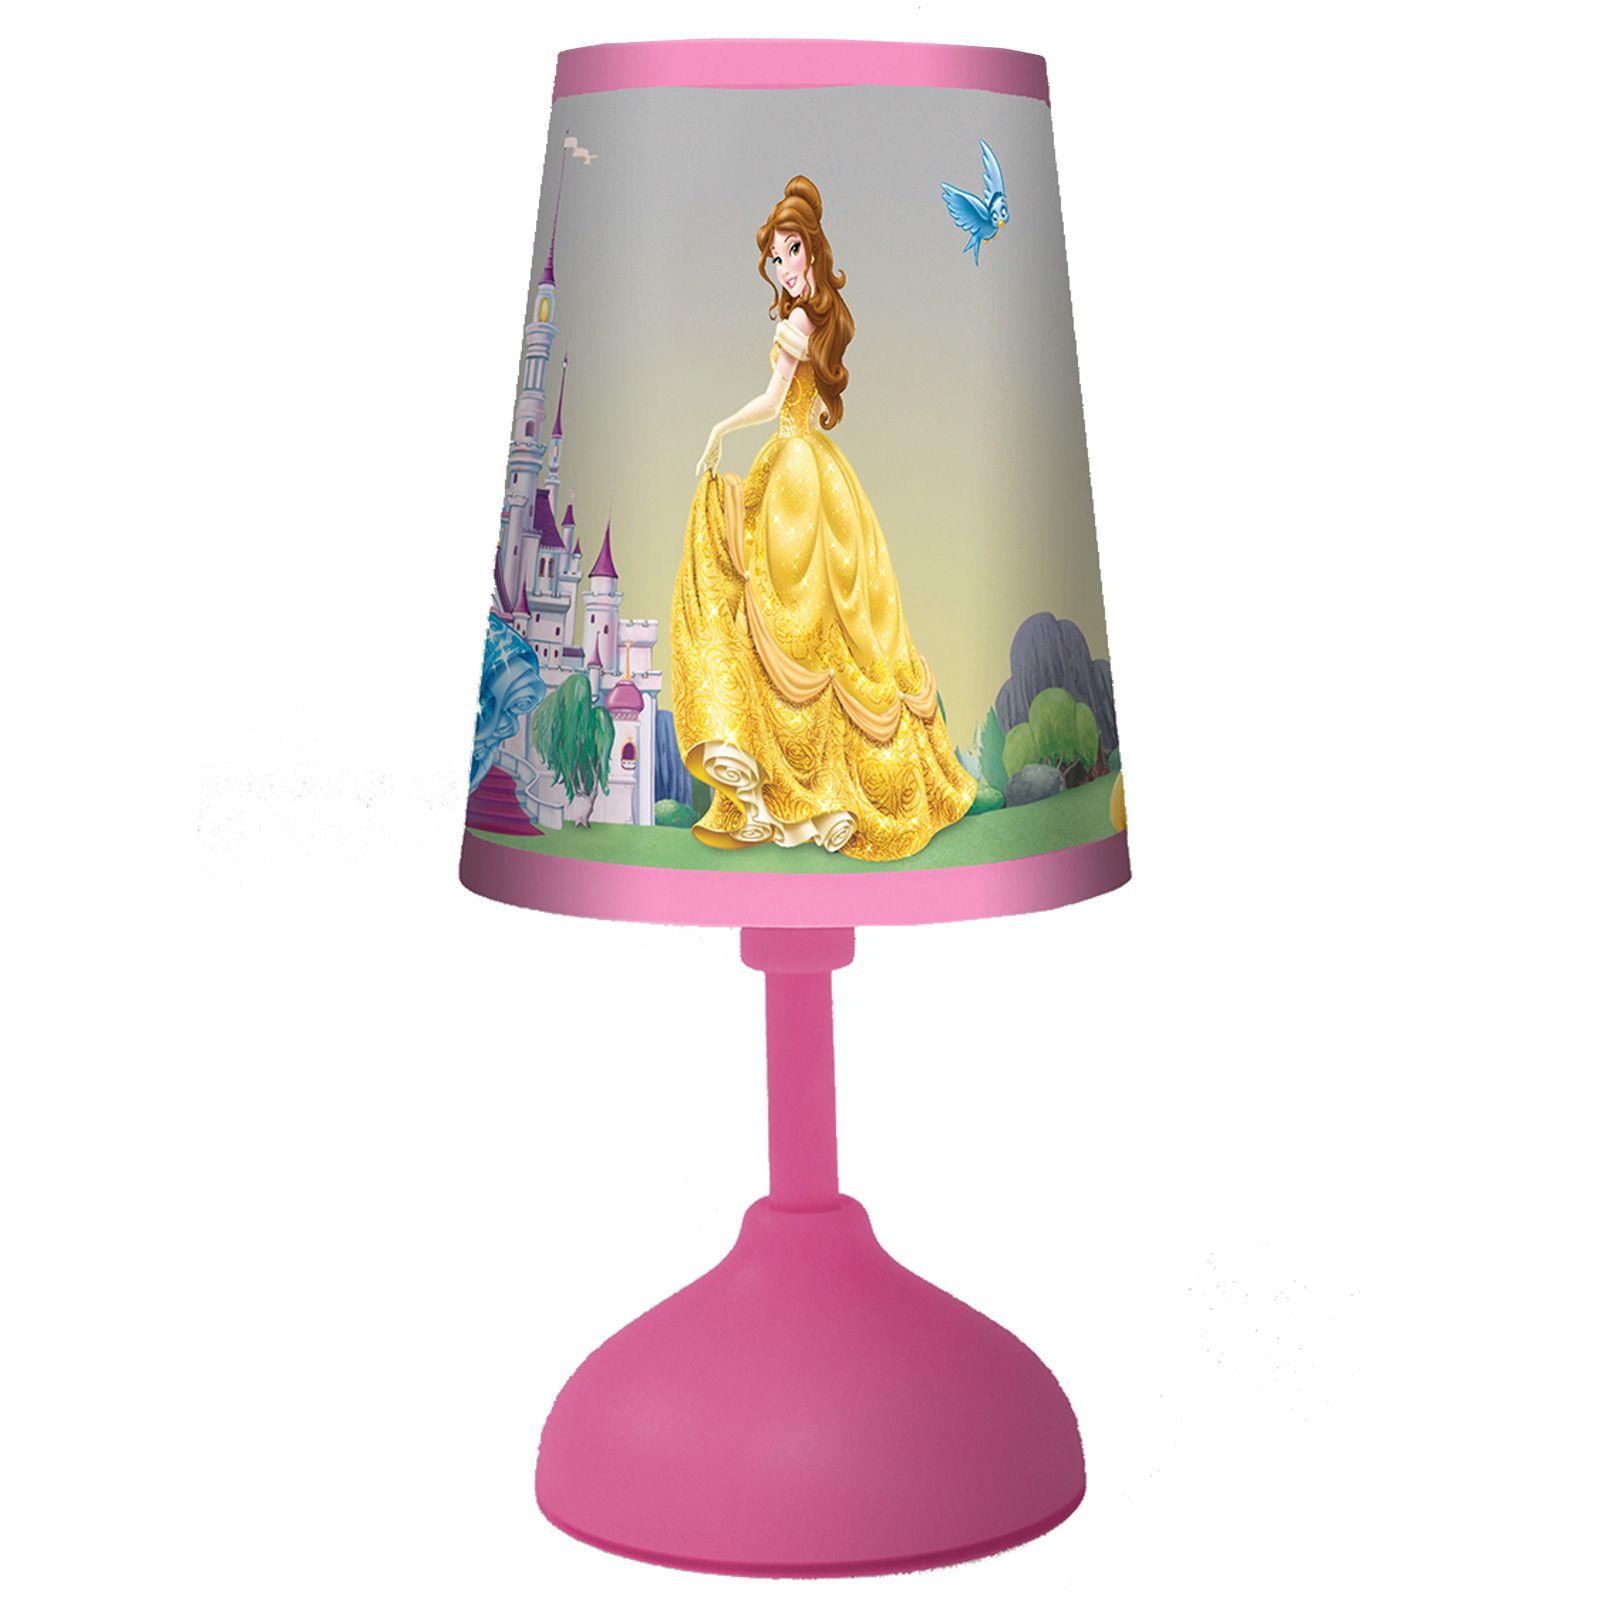 Disney Table Lamp : Disney princess mini table lamp light new official ebay